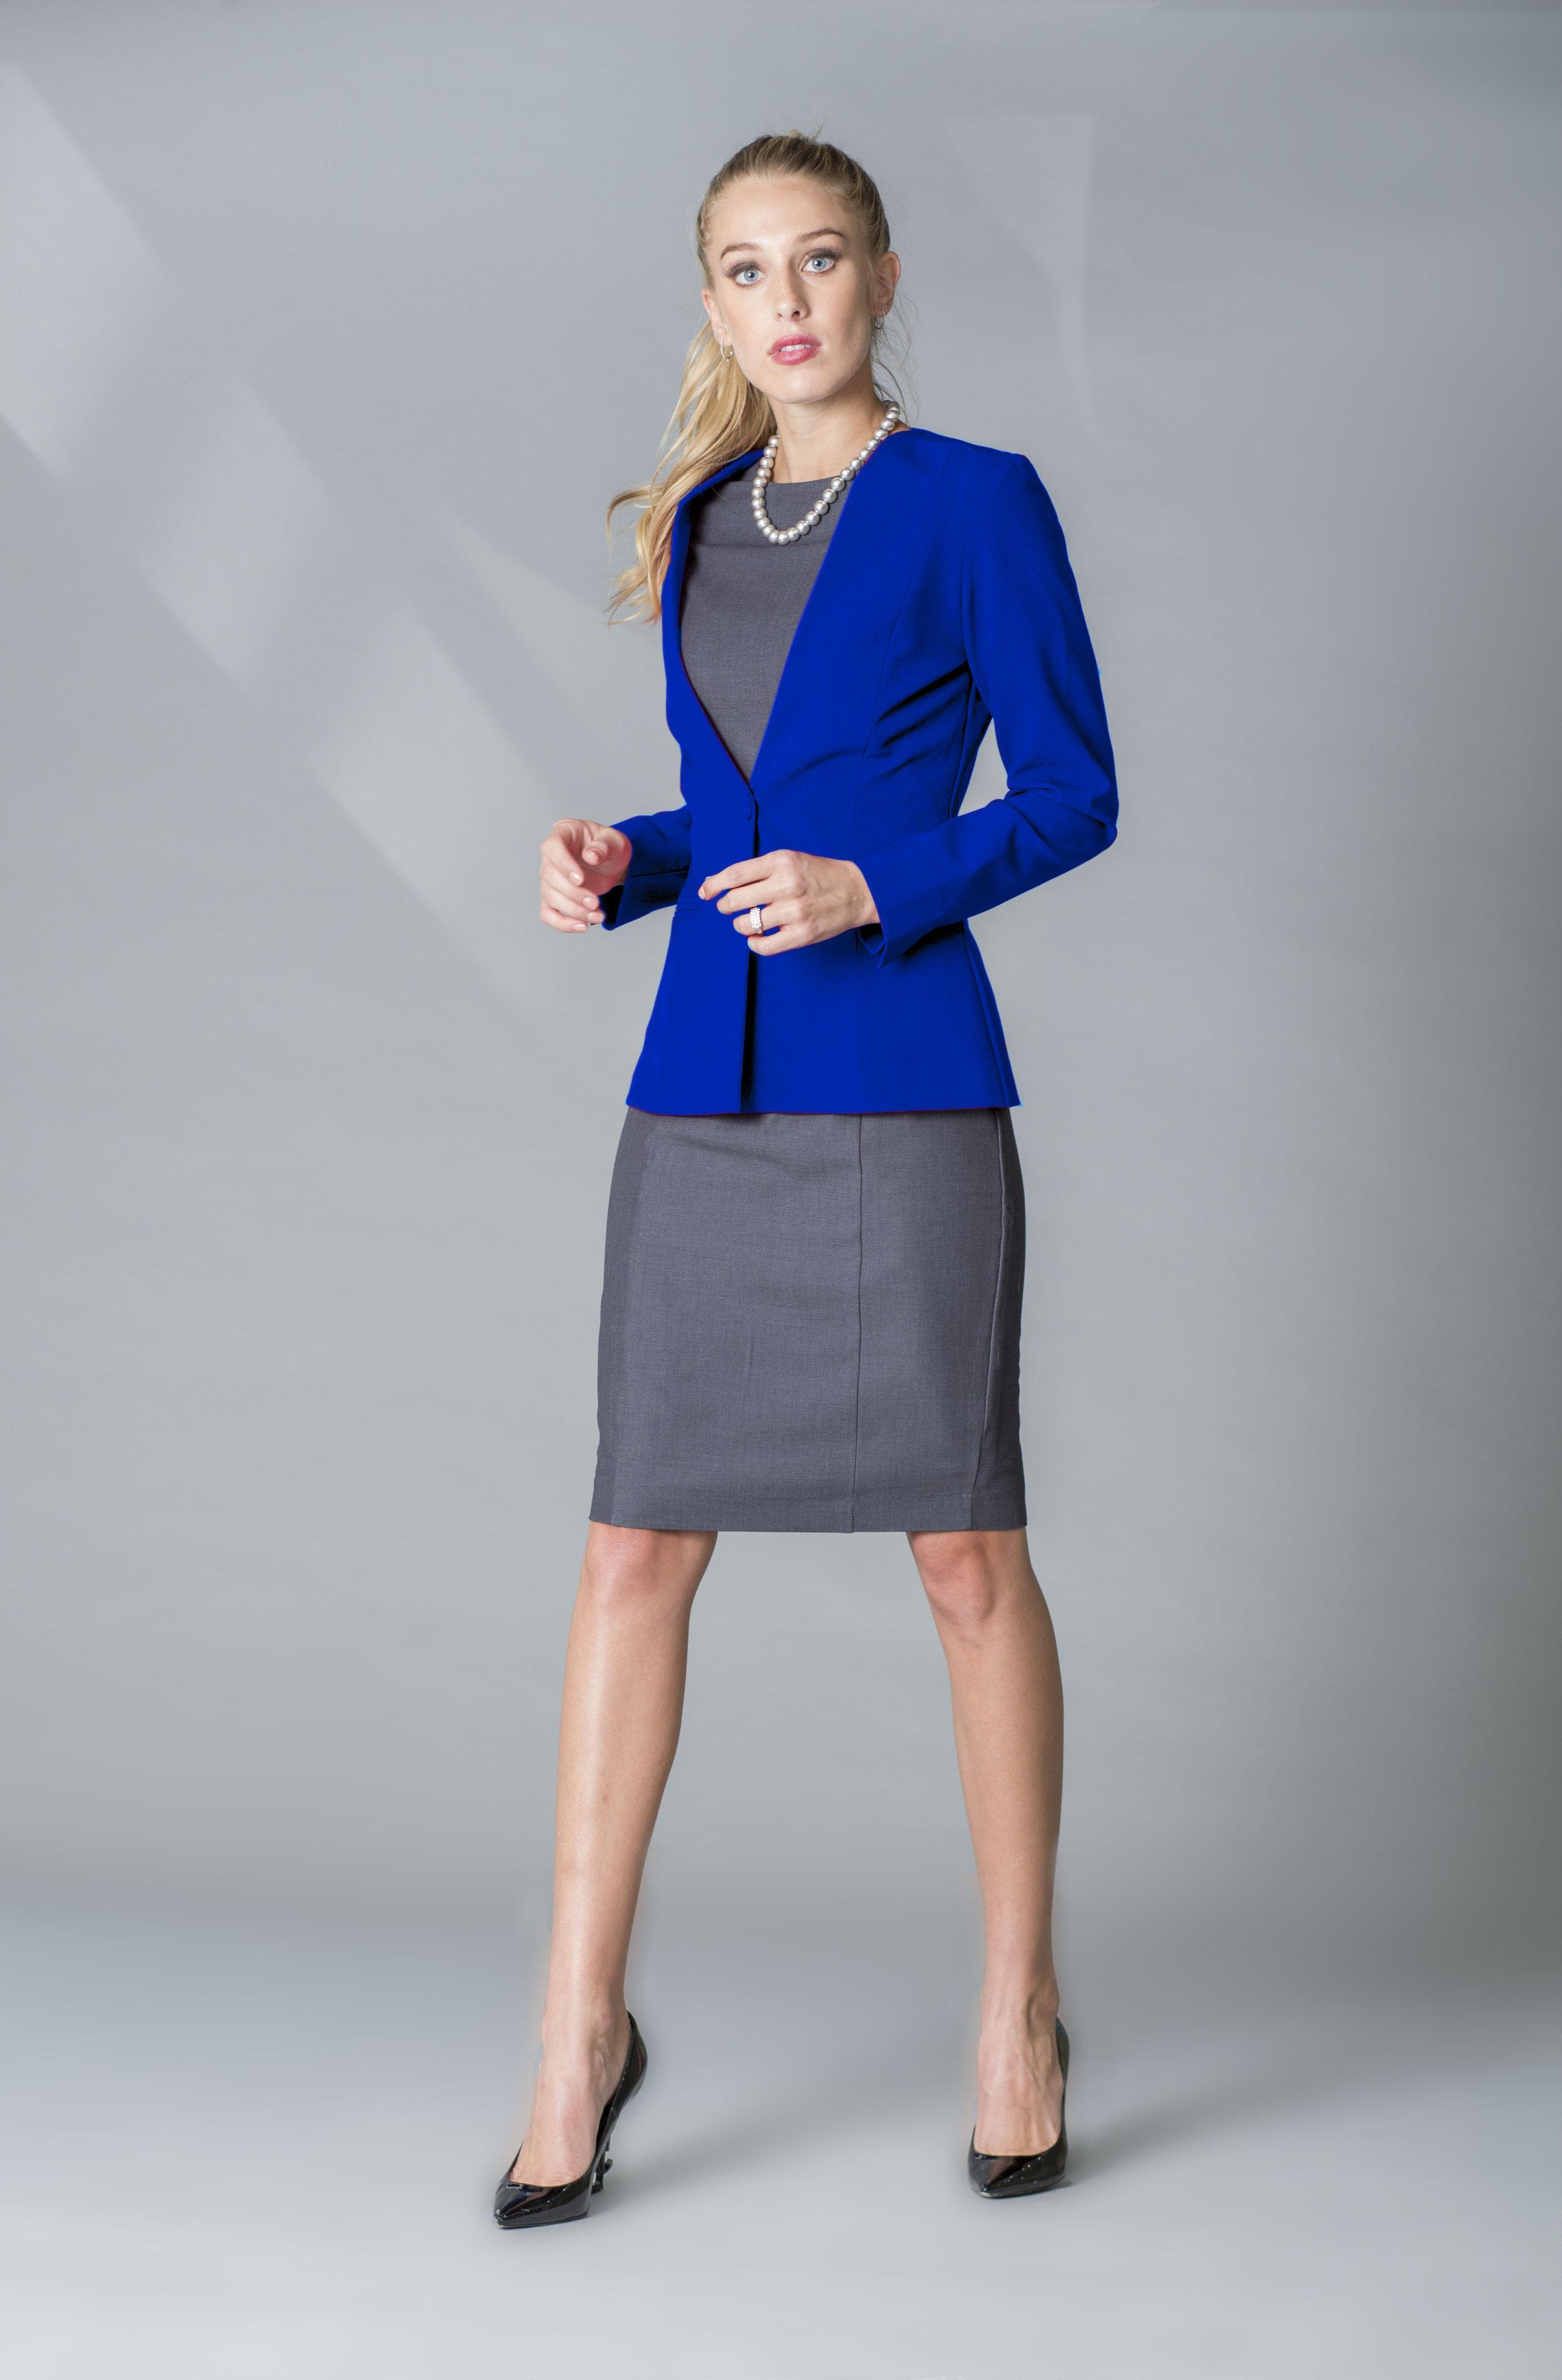 MDSN Vestido VV gris -saco azul rey copy.jpg